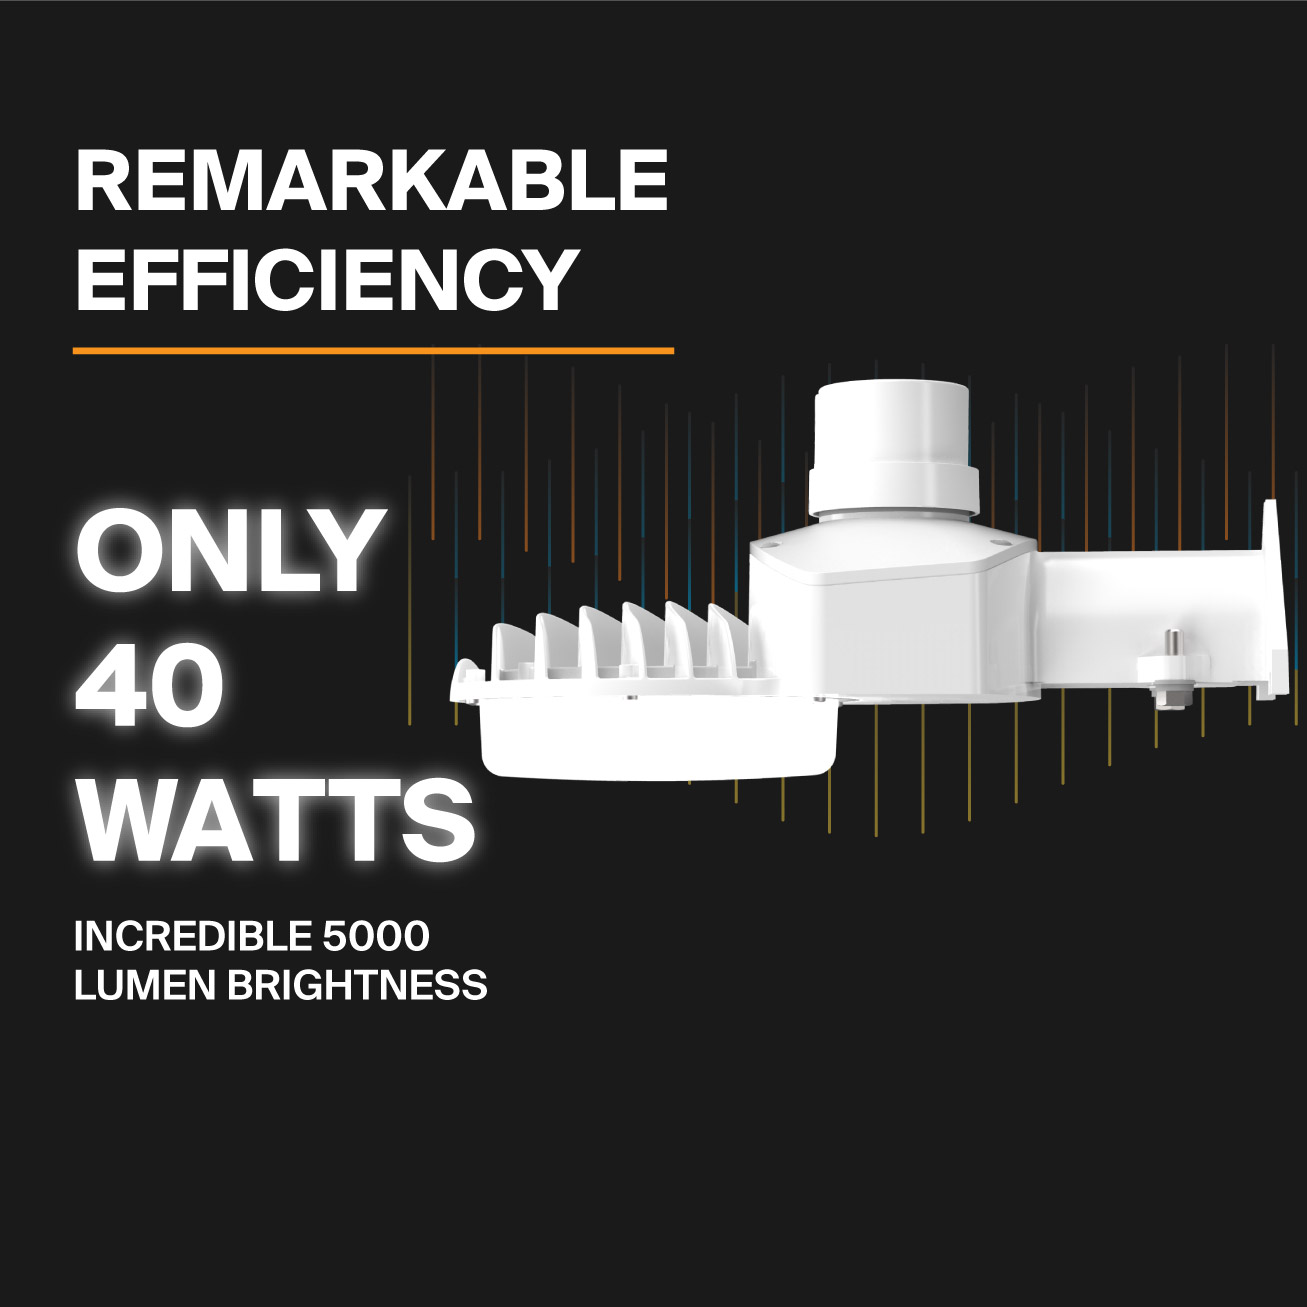 Probrite ASTRA40 LED Area Light Remarkable Efficiency